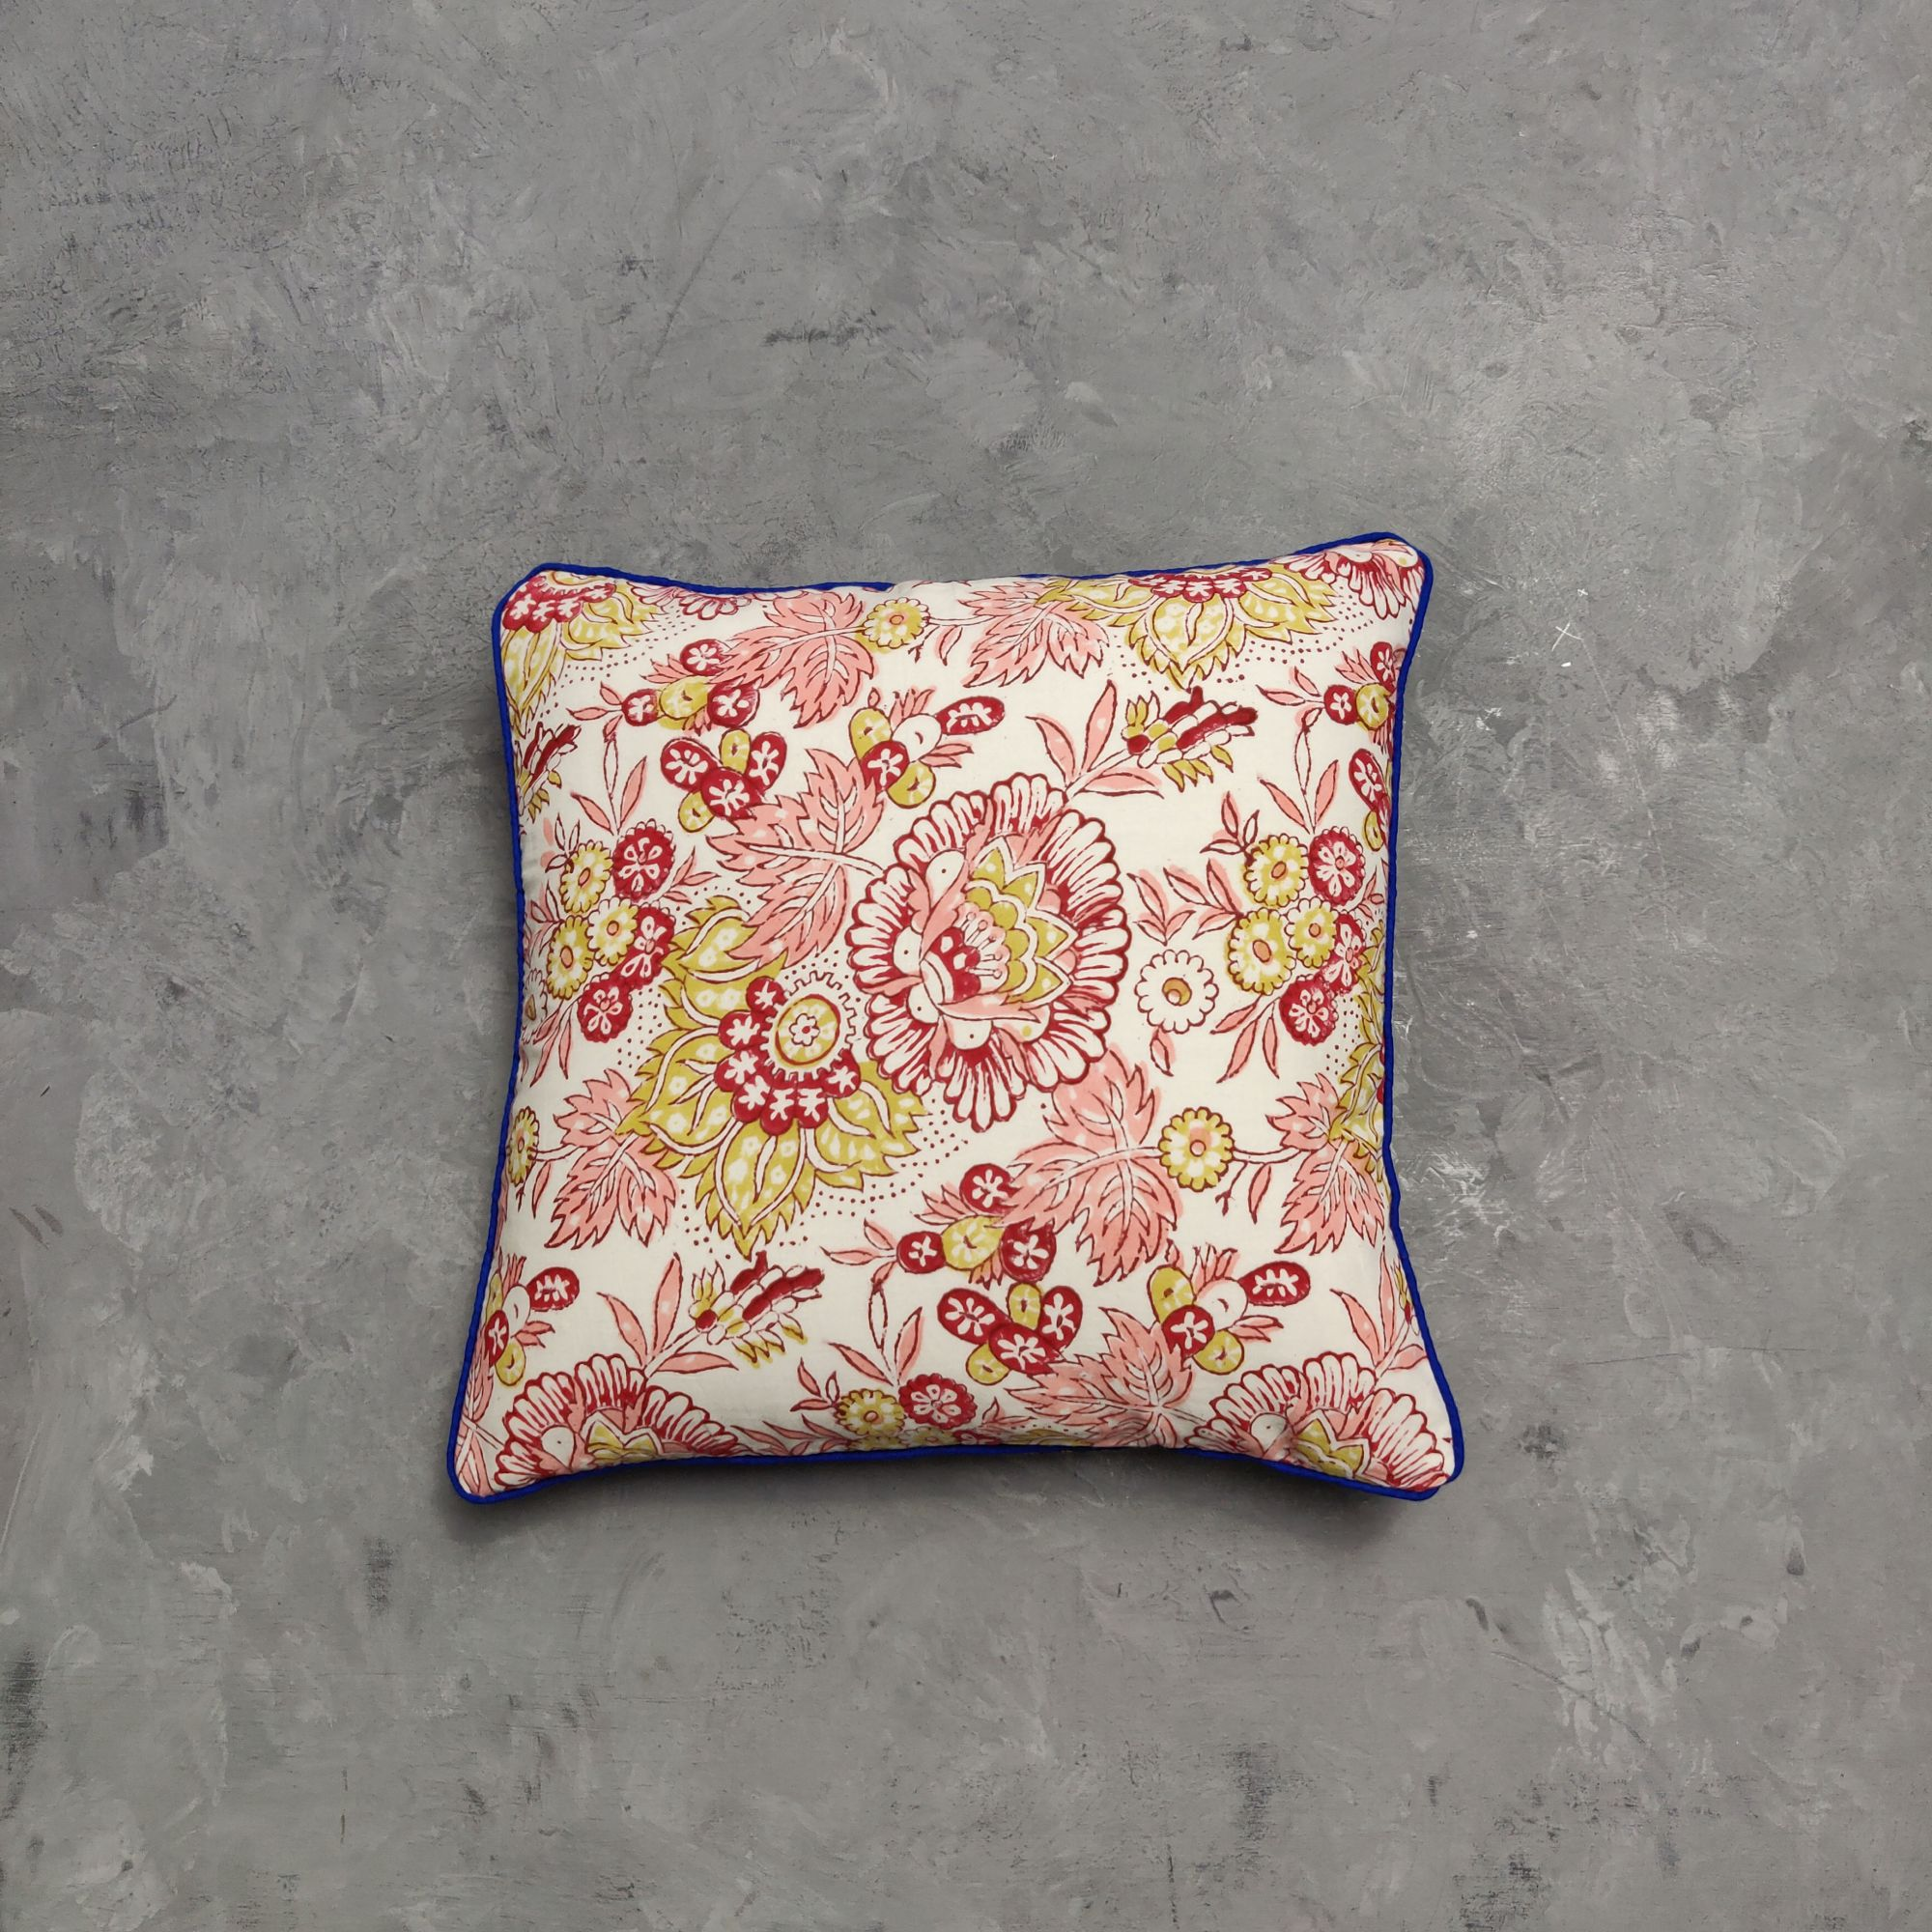 Reversible Handblock Printed Cushion Cover 12X12 C7